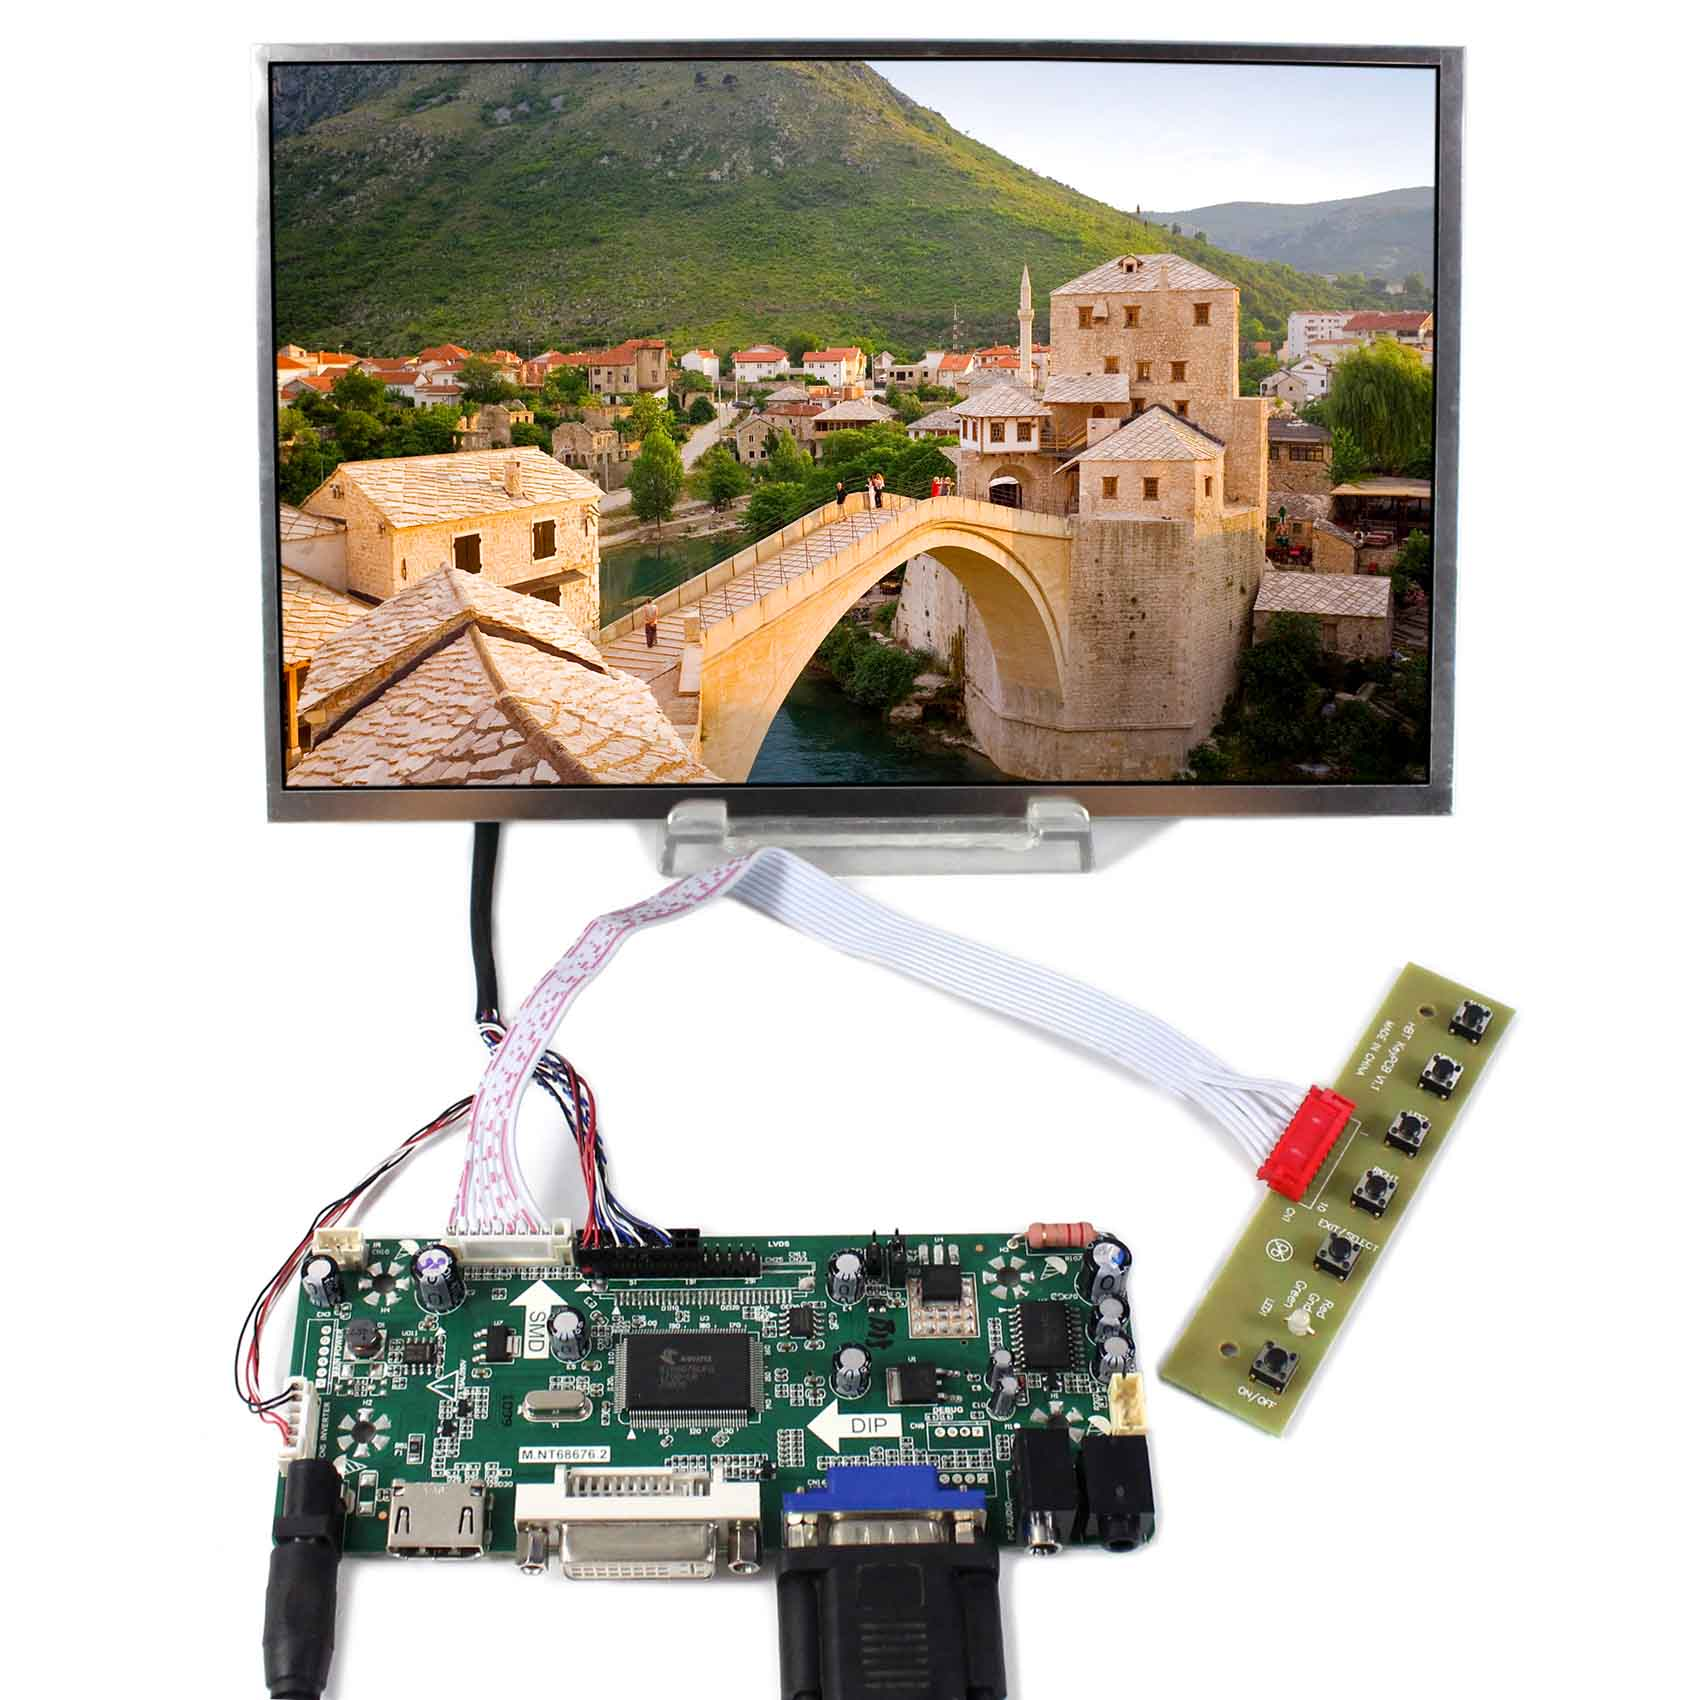 10.1inch B101EW05 1280x800 LCD Screen Wiht HDMI VGA DVI AUDIO LCD Controller Board hdmi vga av audio usb fpv controller board 10 1inch b101ew05 1280x800 touch panel screen model lcd for raspberry pi